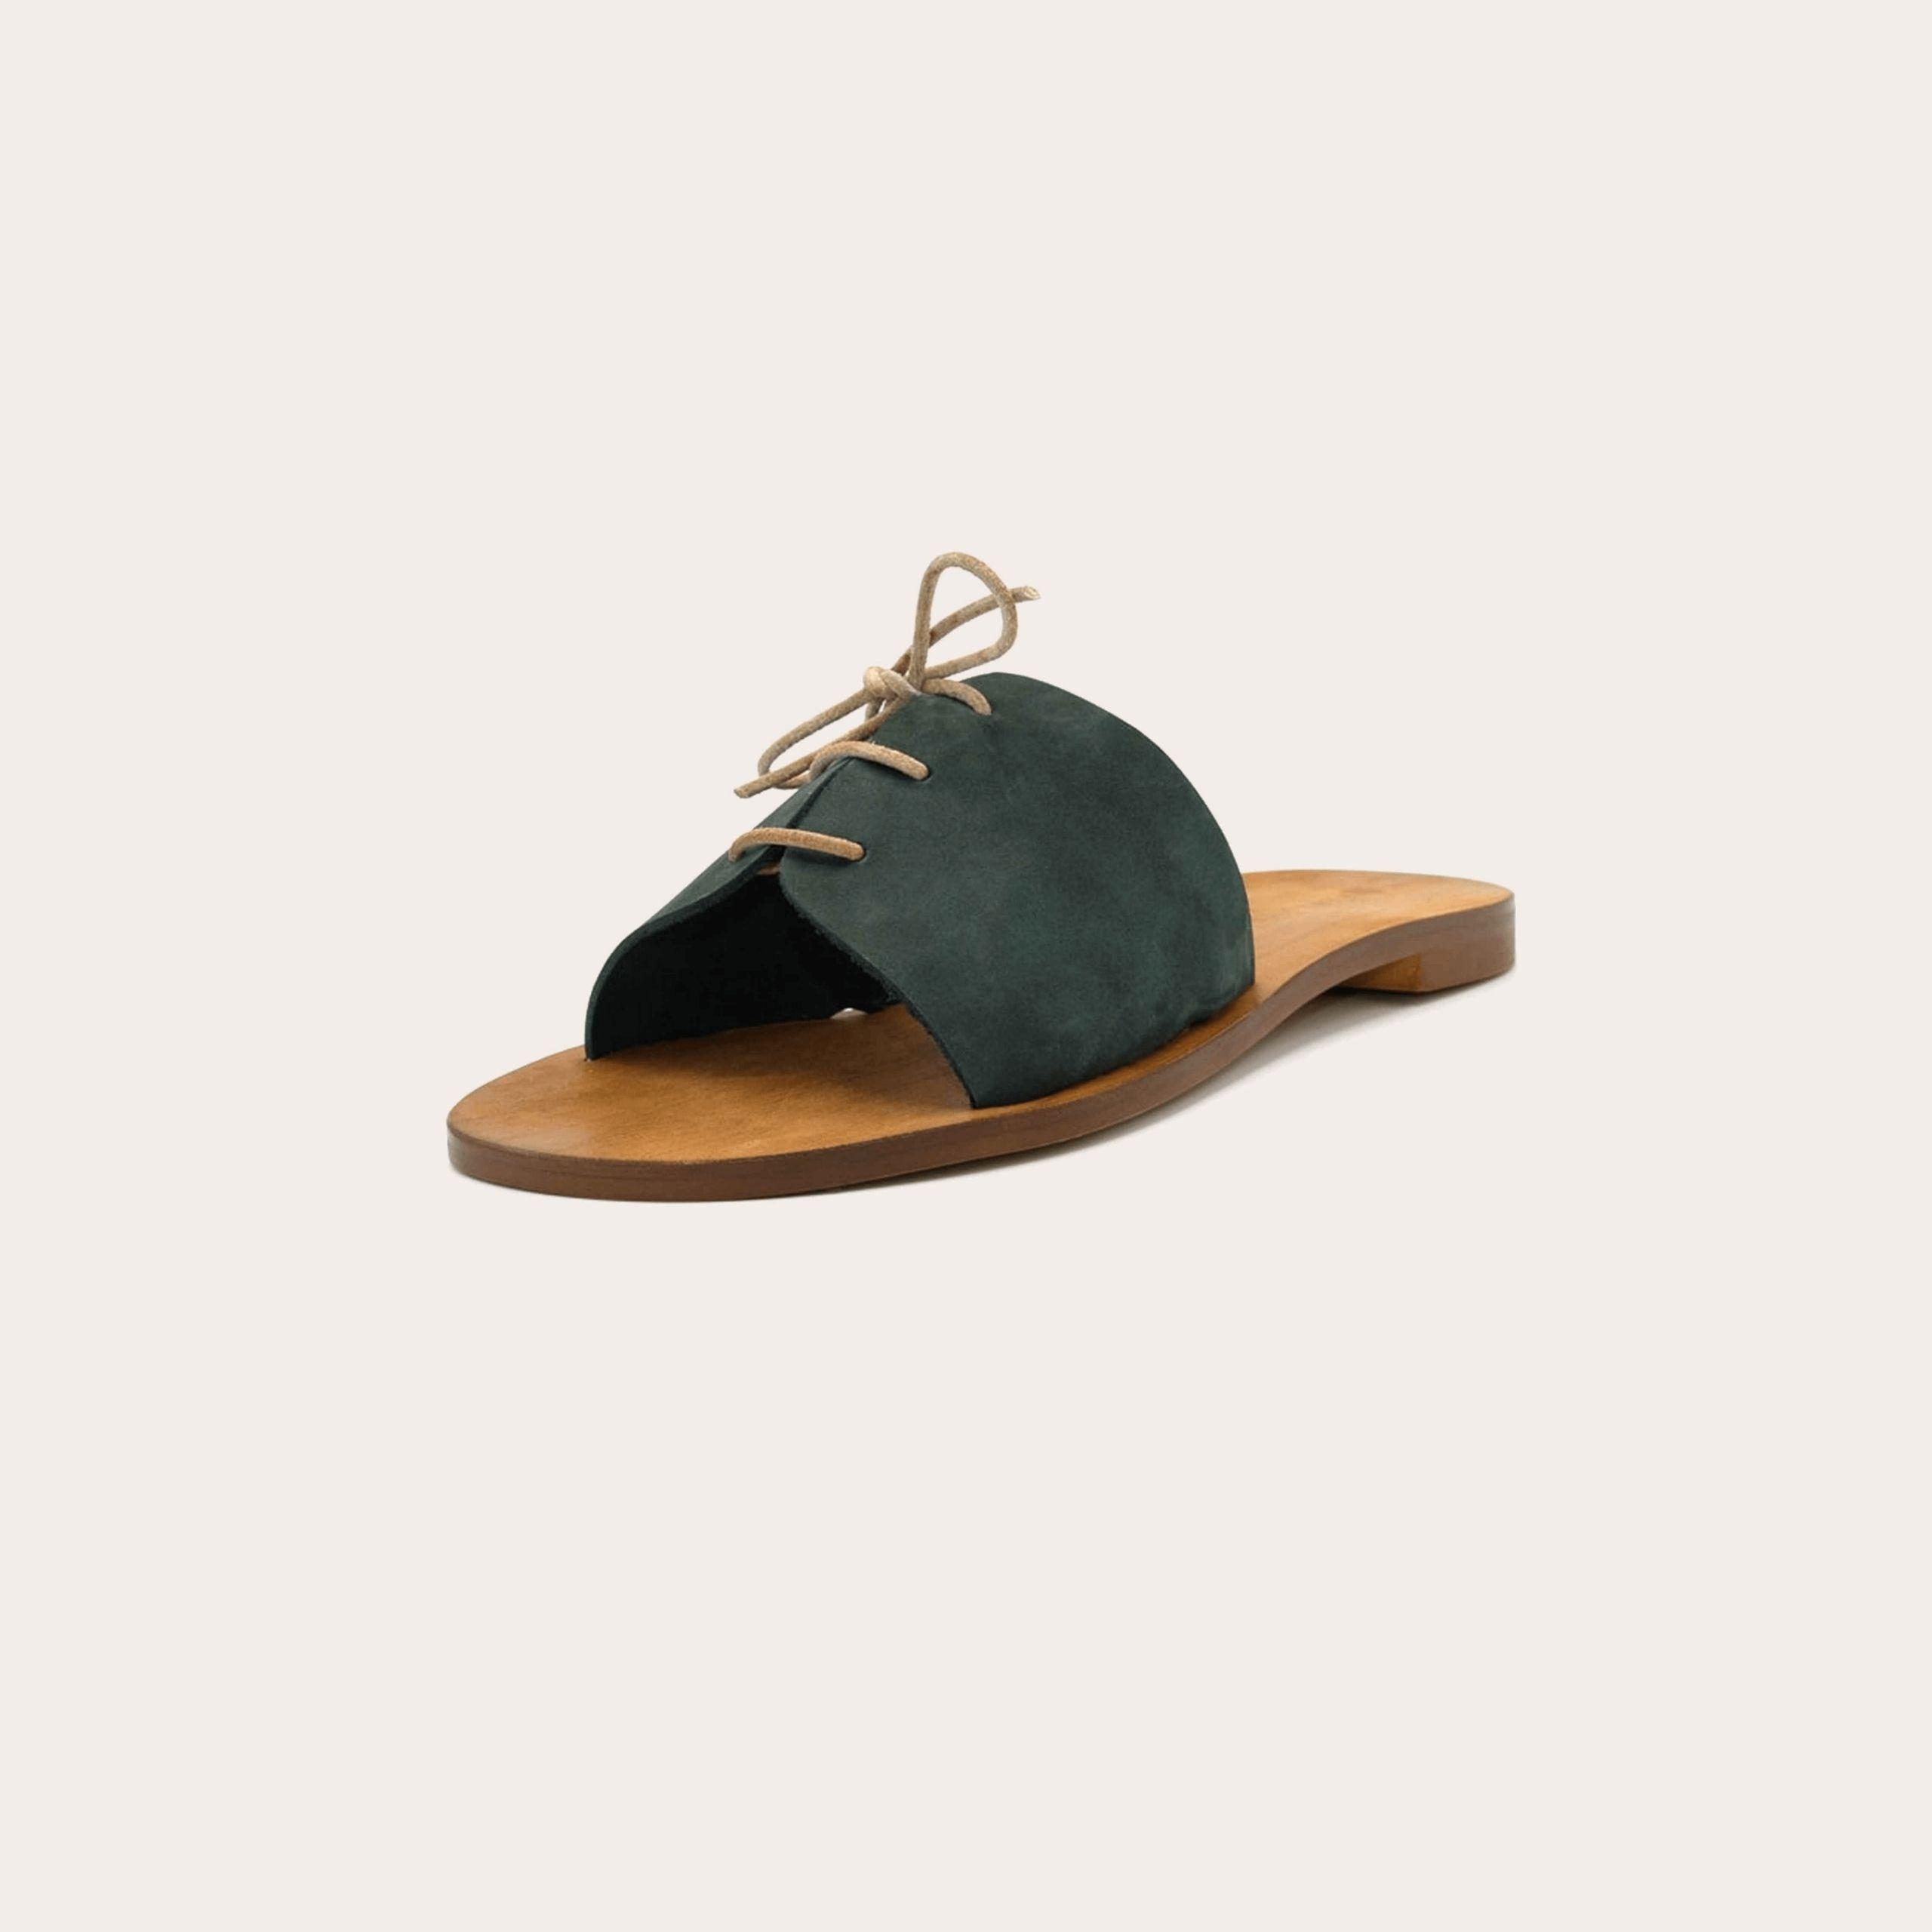 cali-blue_4_lintsandalen sandals travelsandals vegan sustainable sandals wikkelsandalen